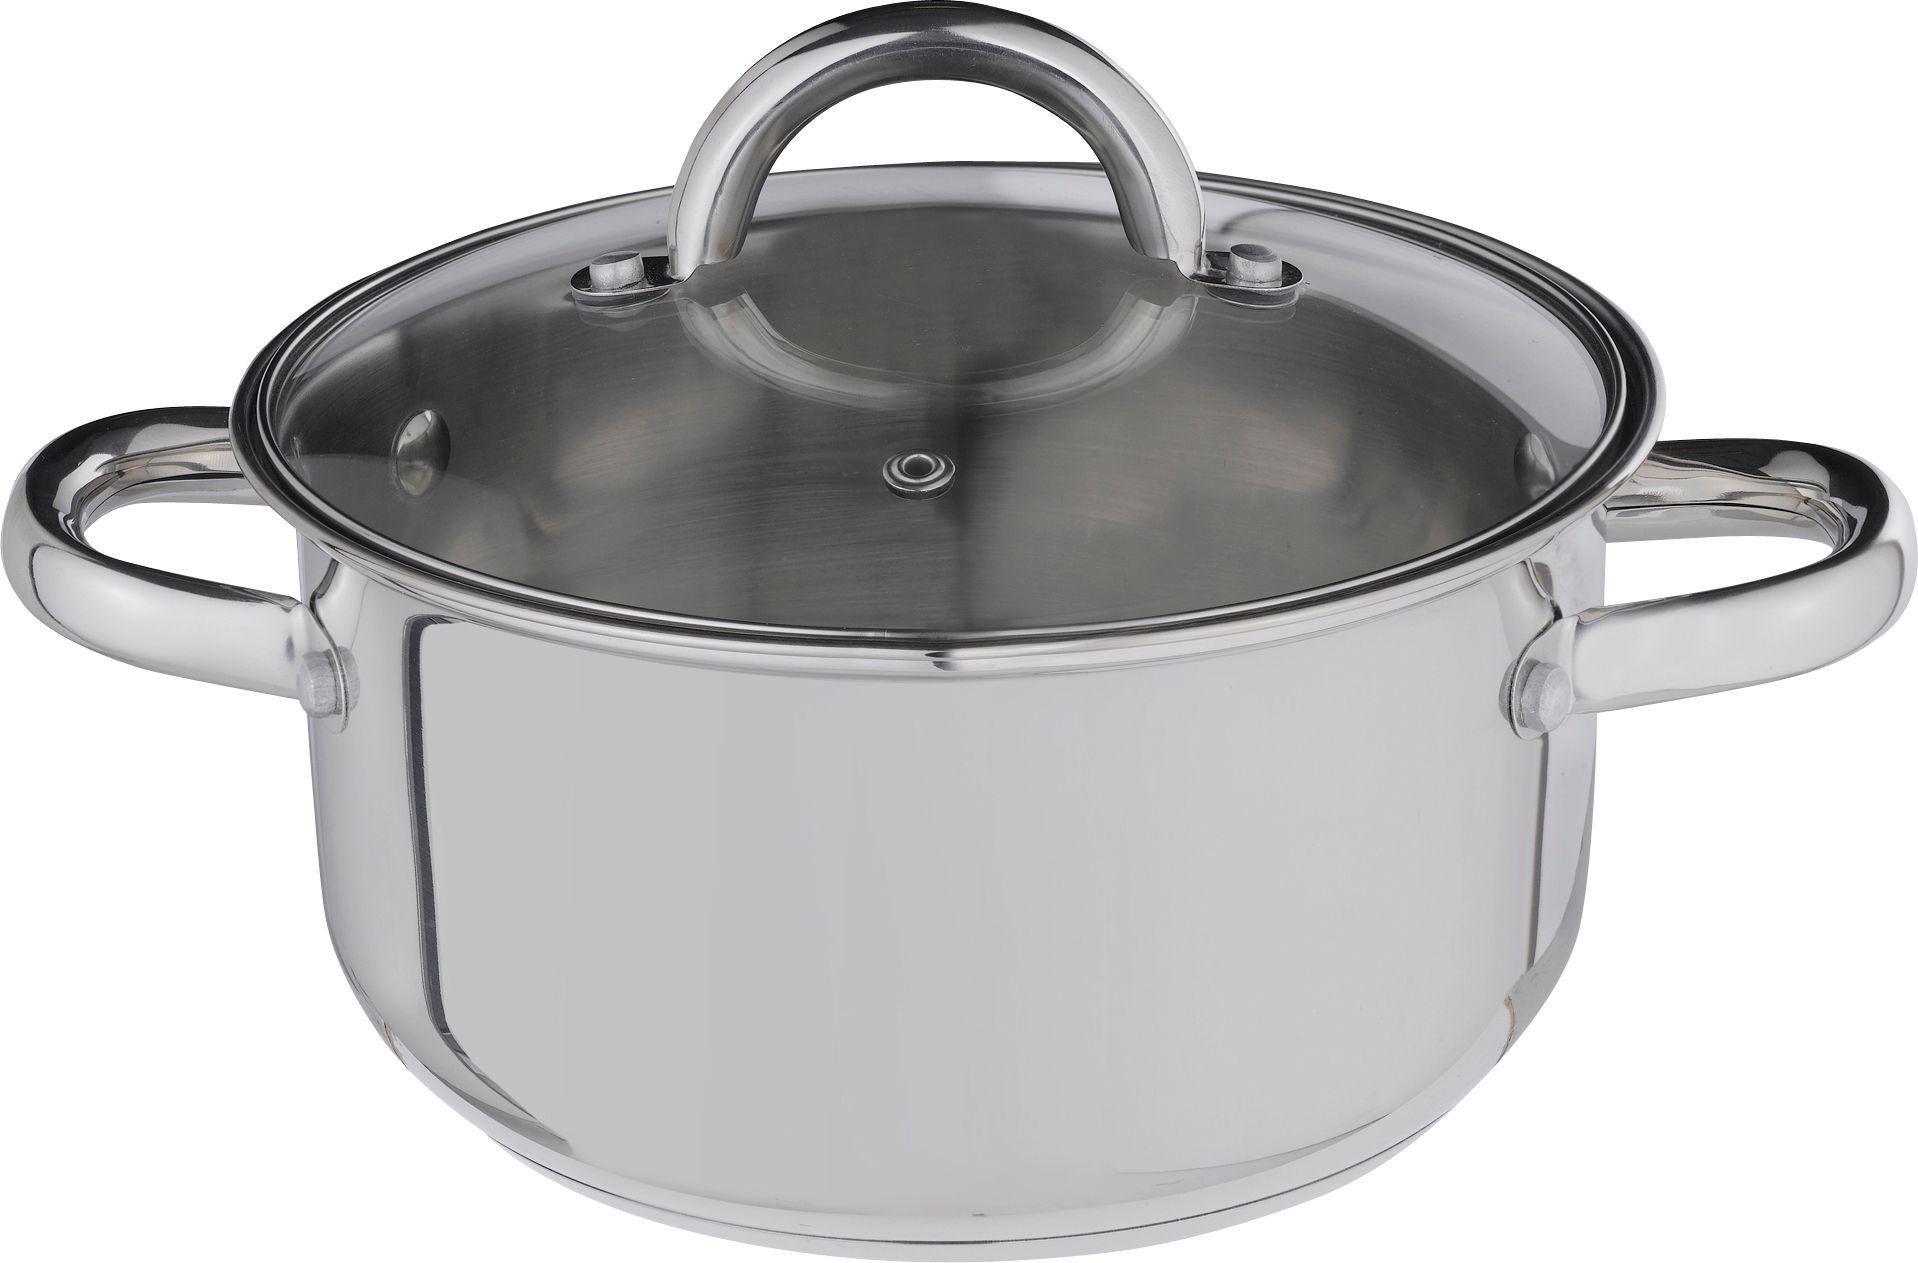 HOME - 20cm Stainless Steel Casserole Pot